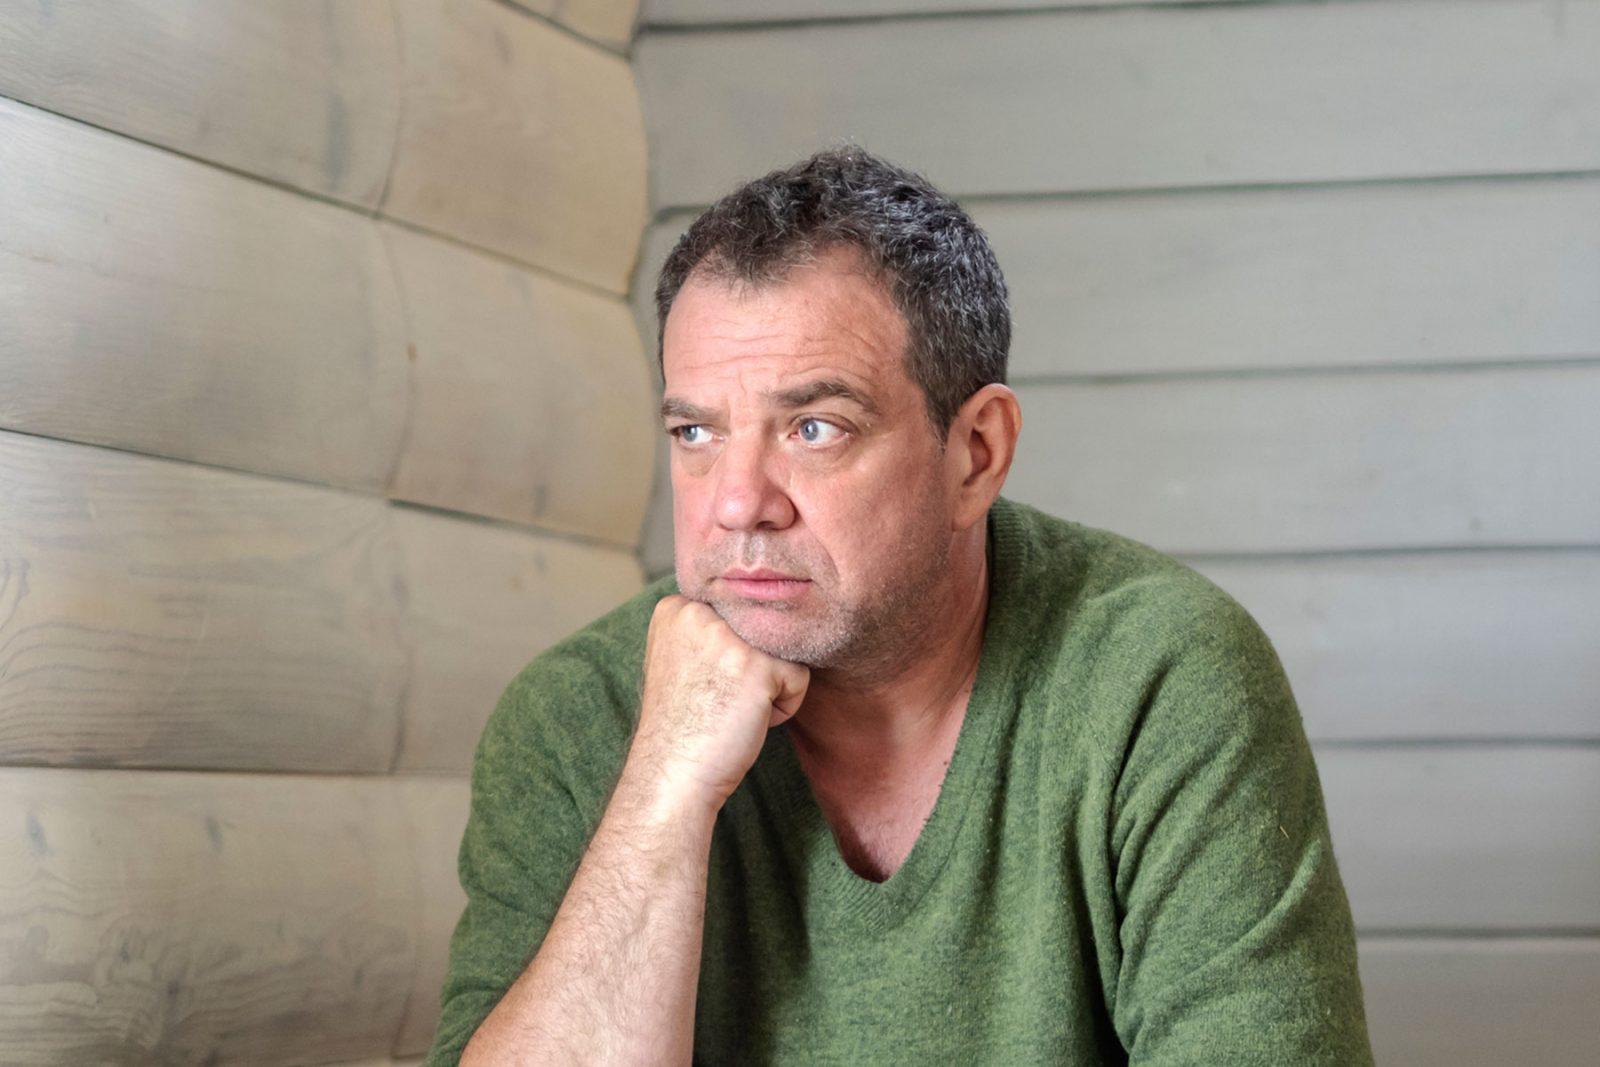 Man sat in a room looking sad